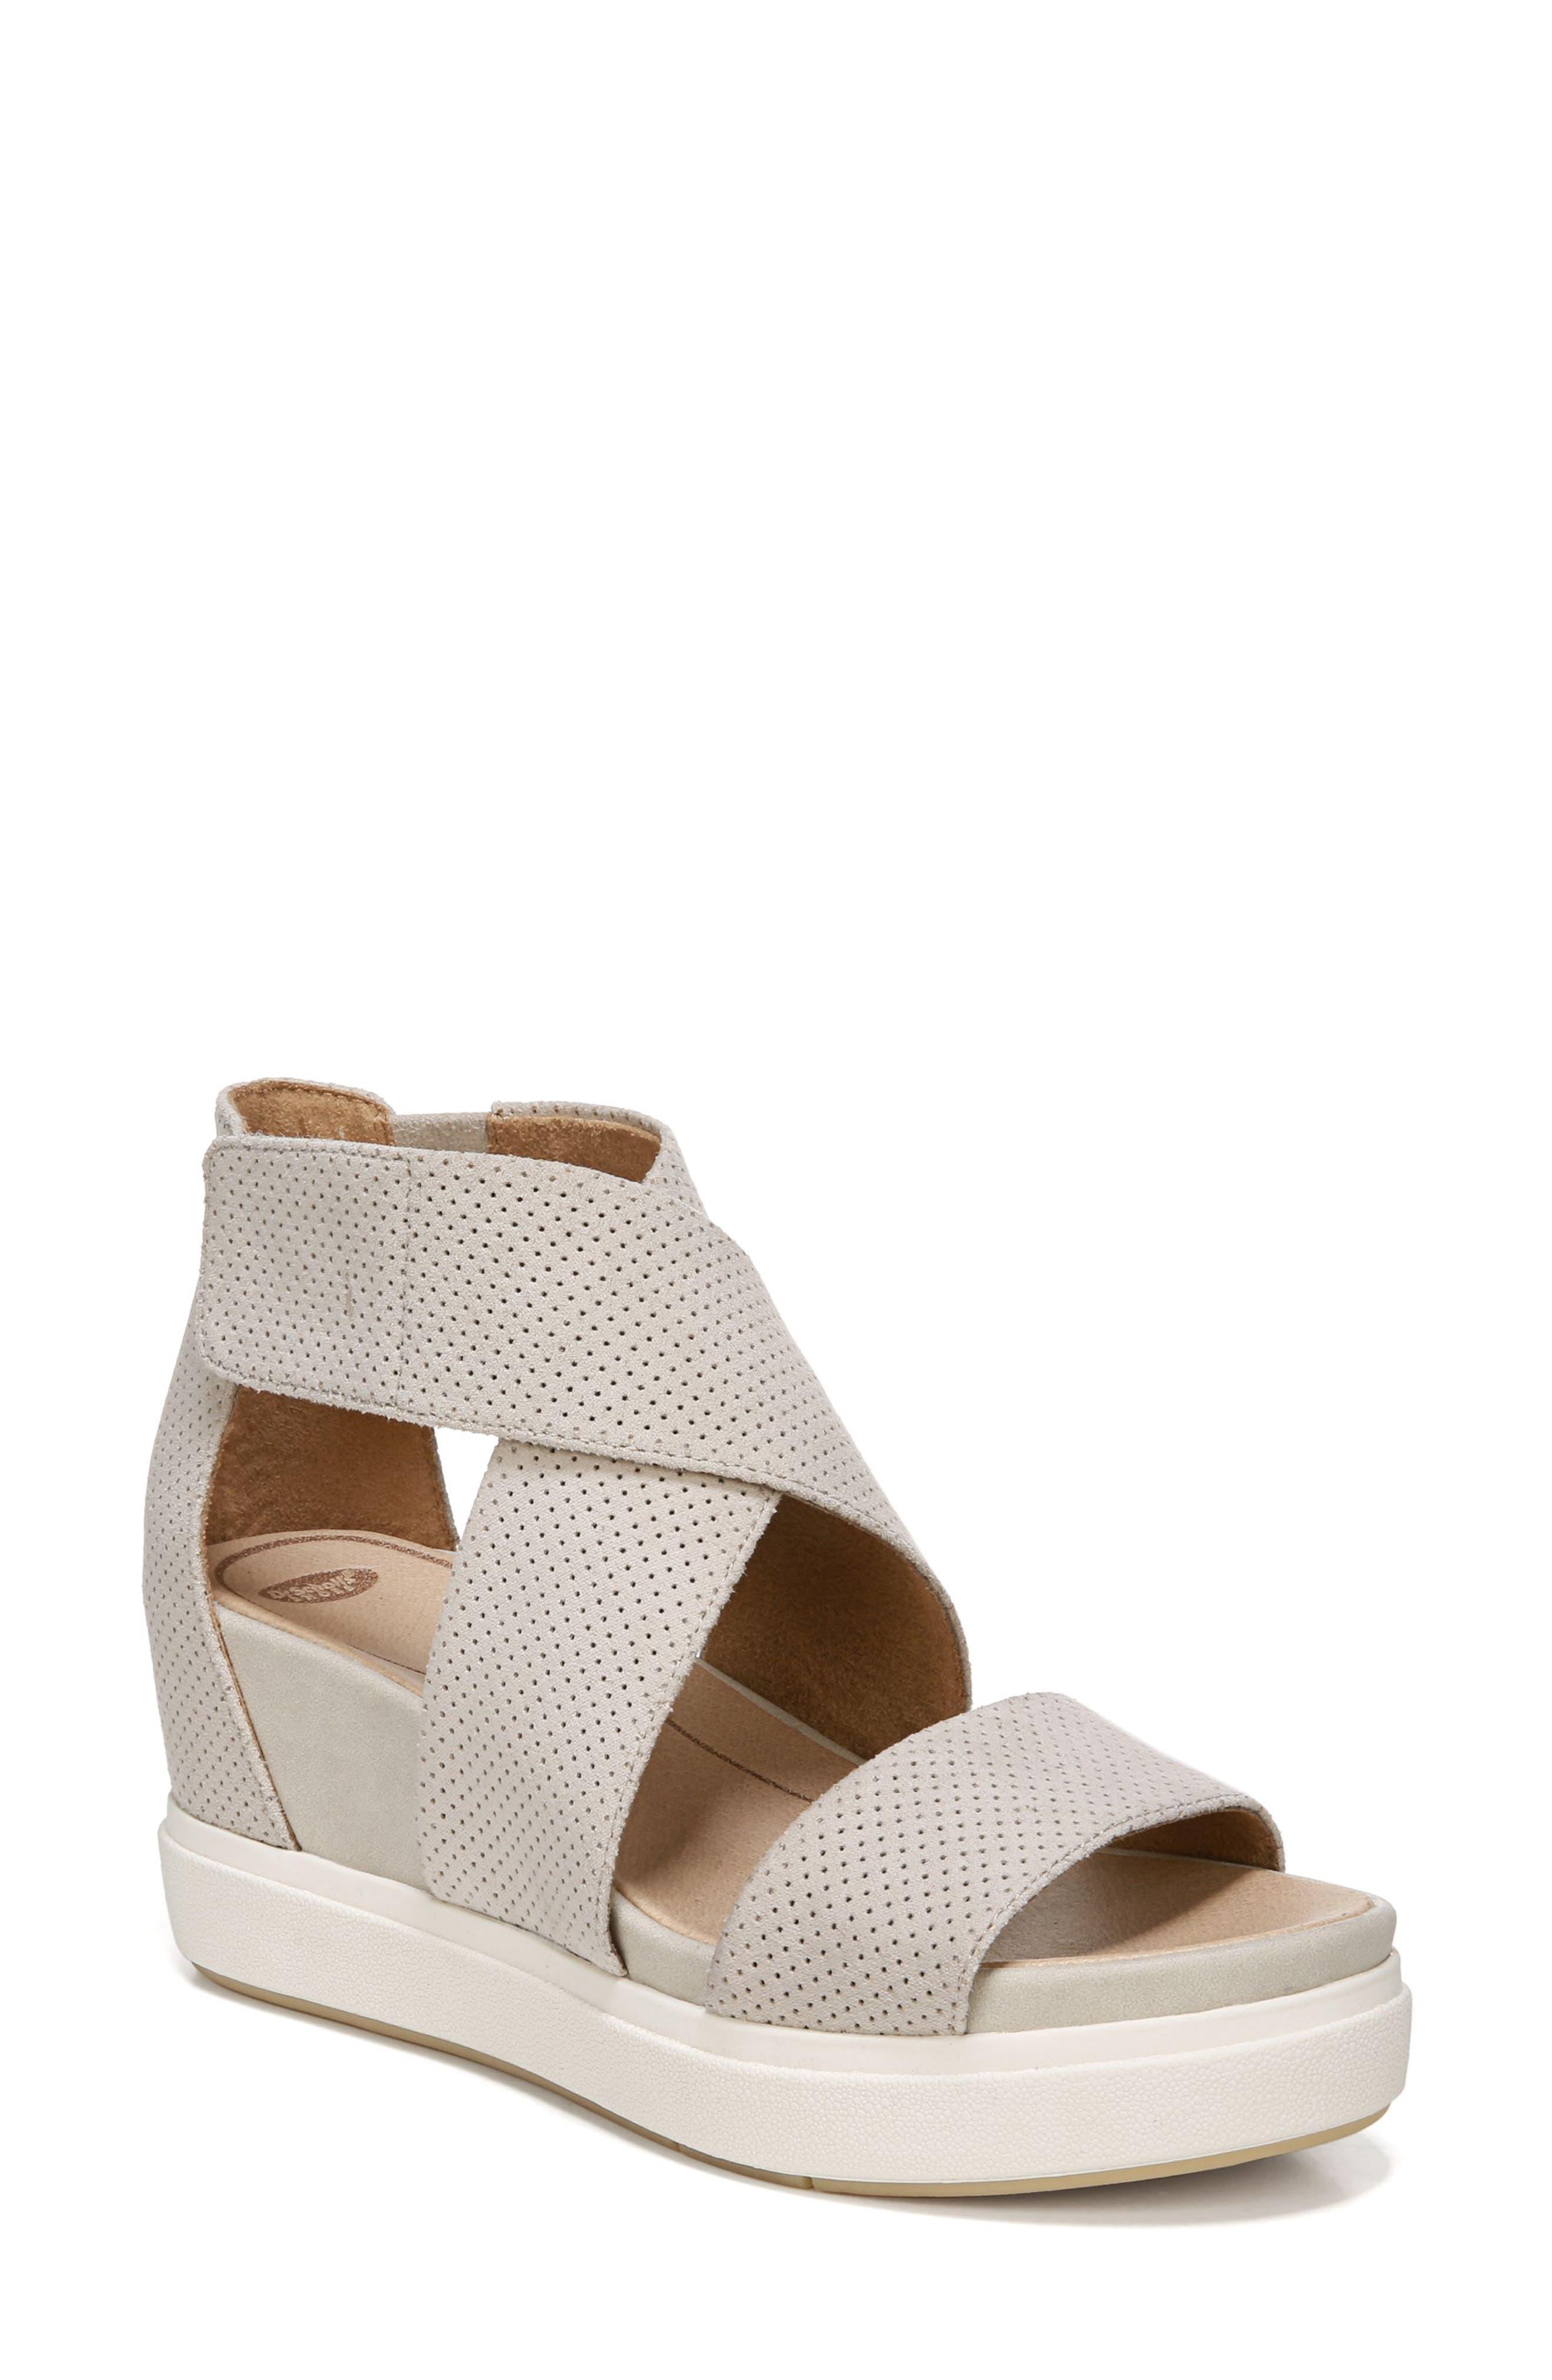 Sheena Sport Sandal